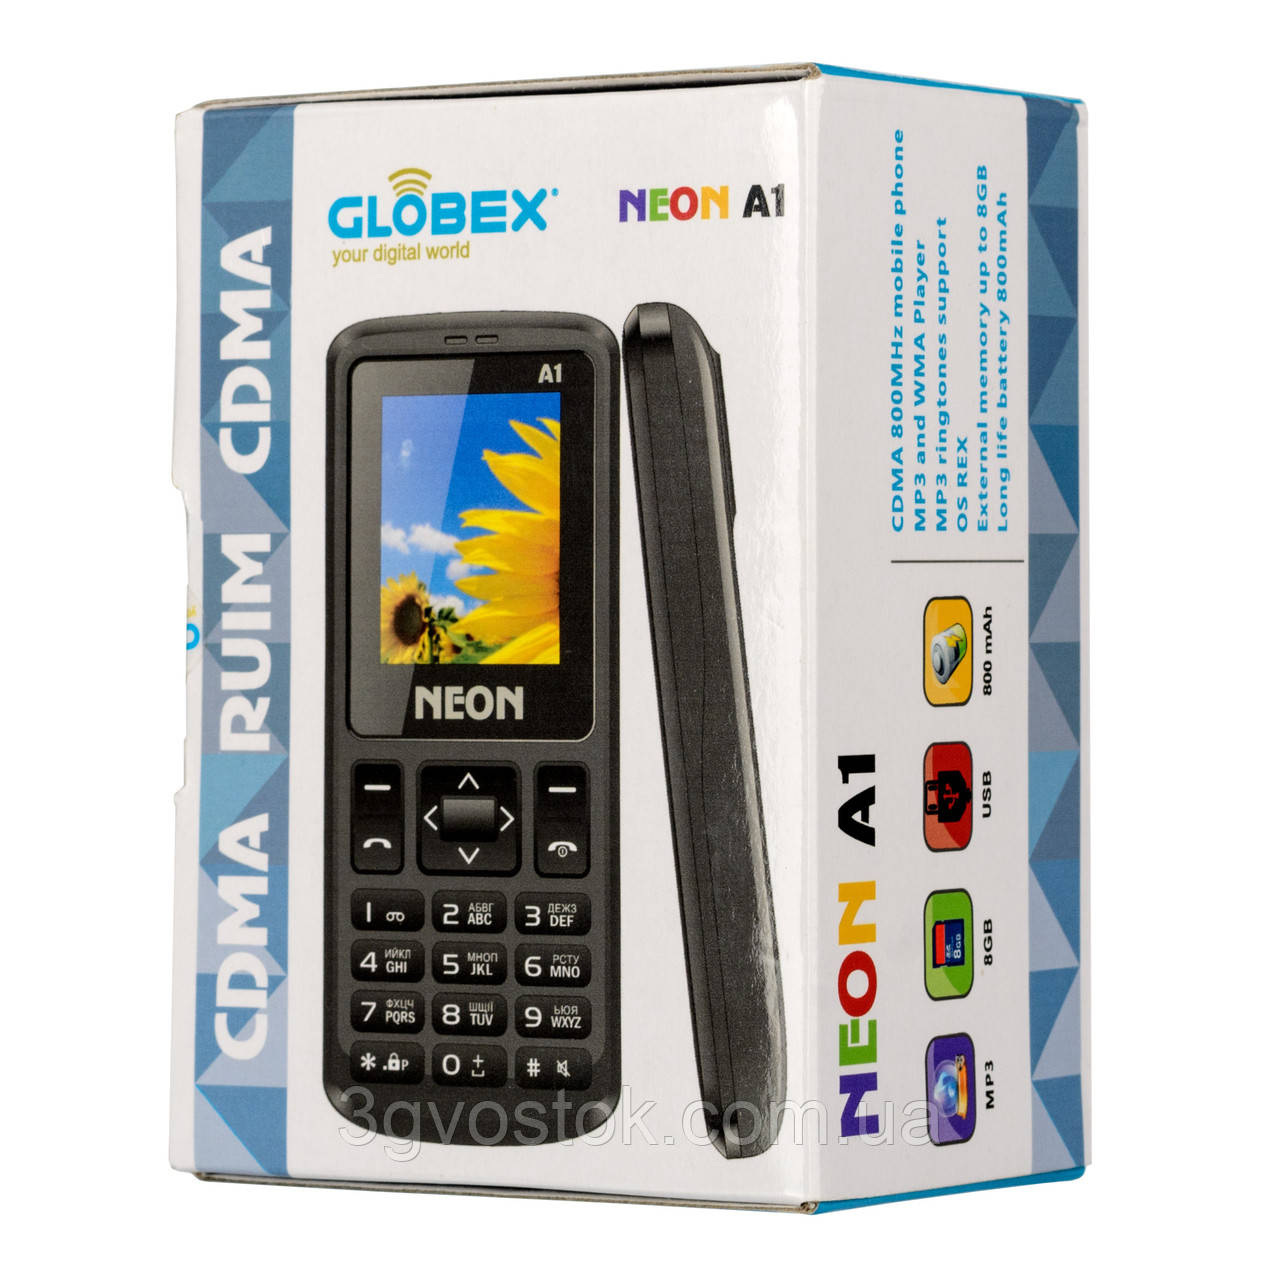 Globex Neon A1